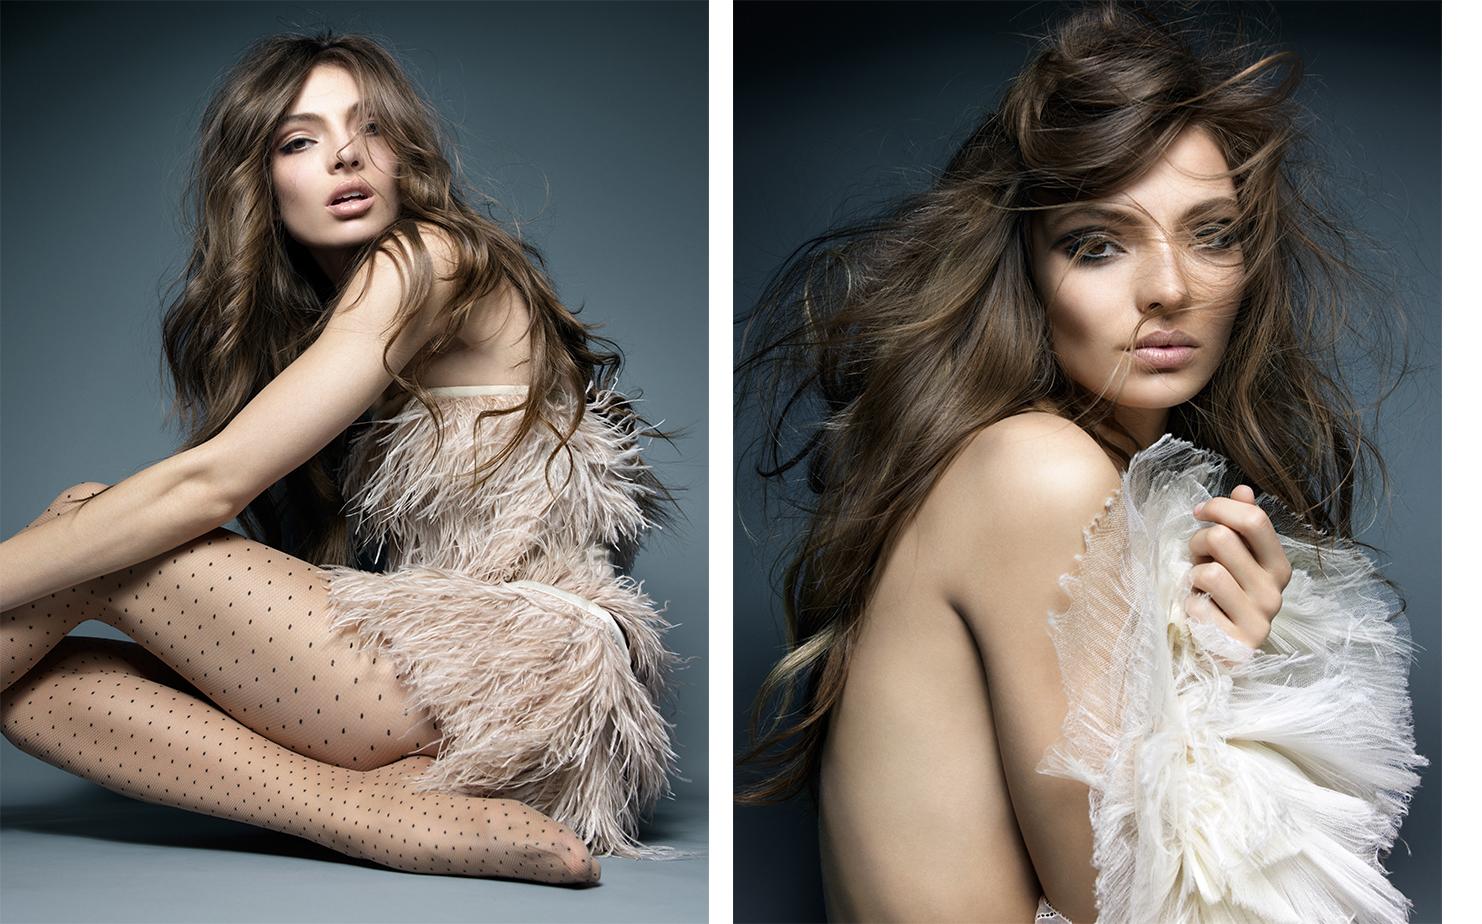 Vogue Japan HEAVENLY HAIR TO LOVELY LEGS   BEAUTY DIRECTOR Kathy Phillips FASHION DIRECTOR Tiina Laakkonen